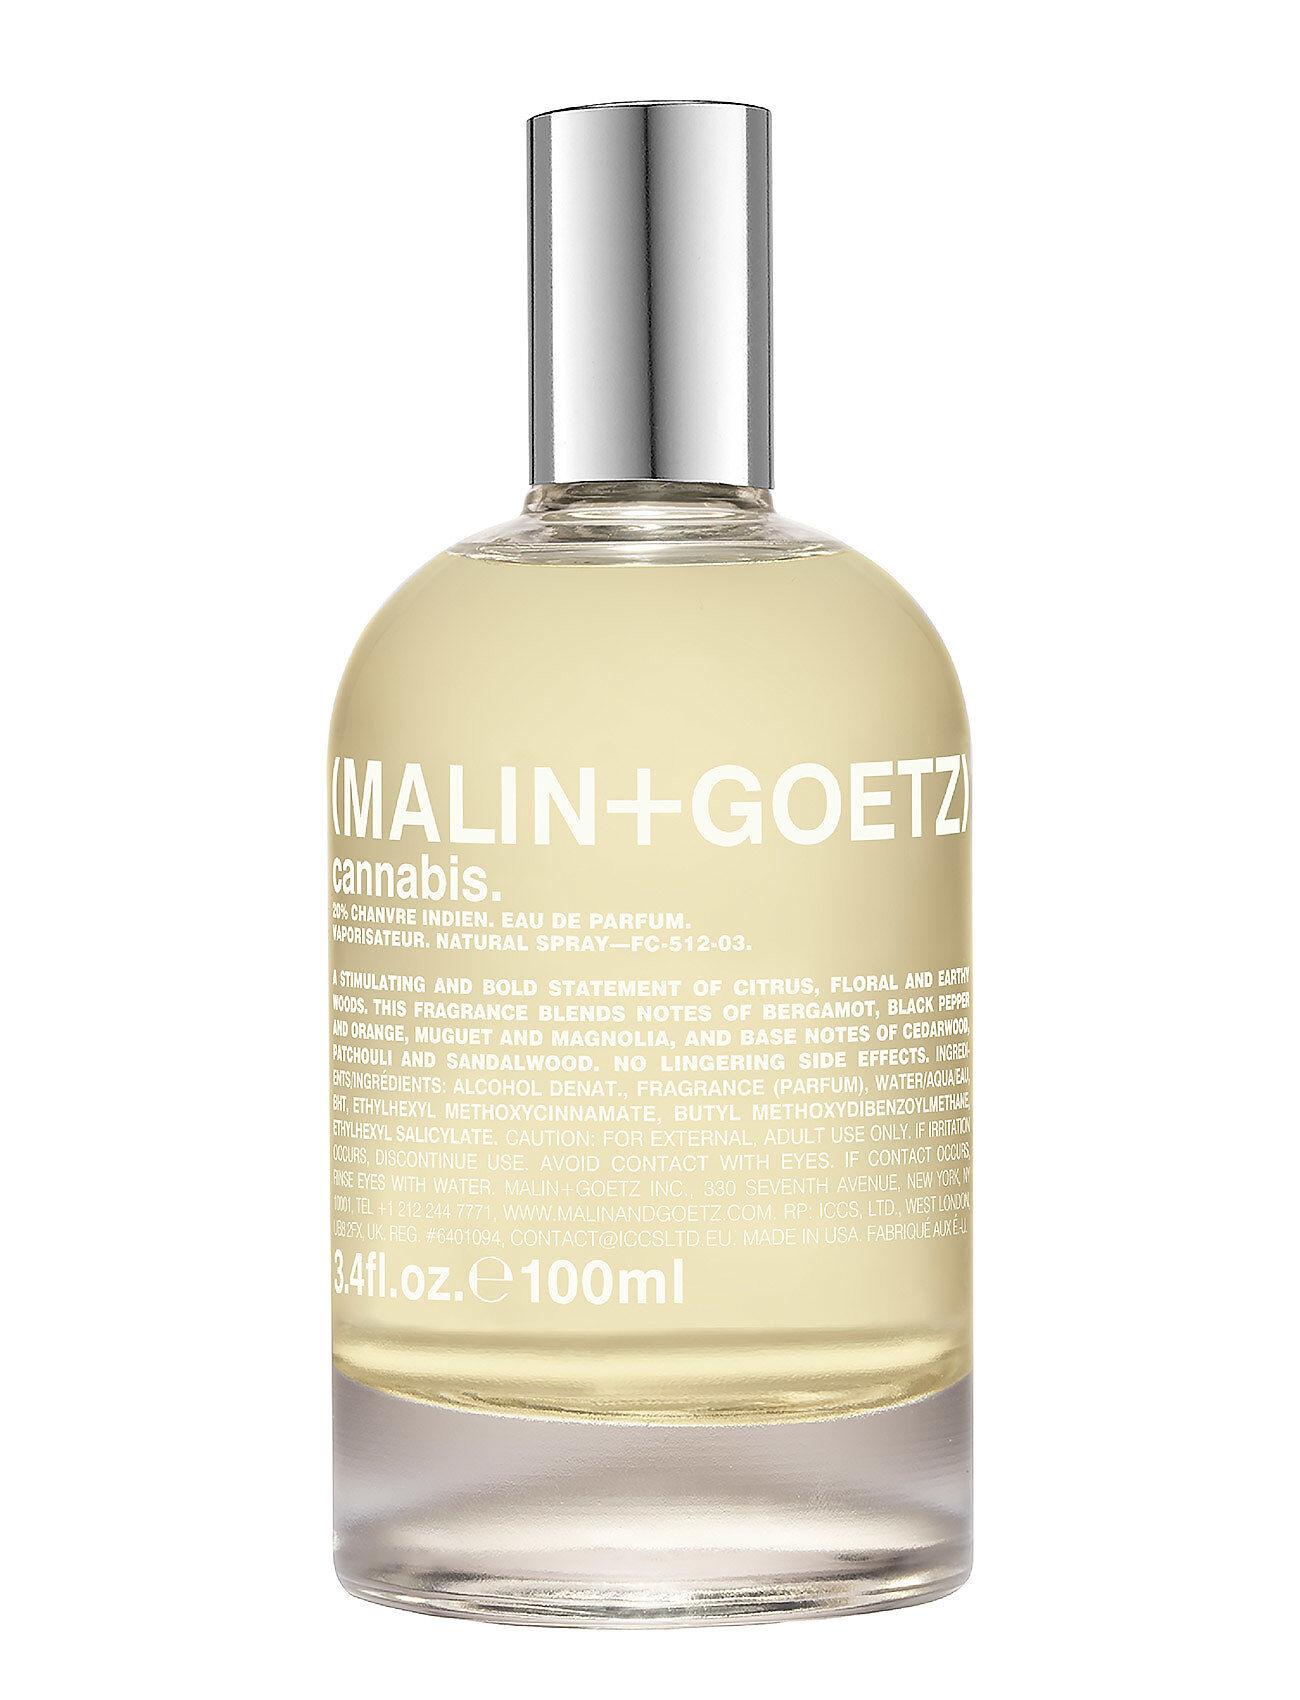 Malin+Goetz Cannabis Eau De Parfume